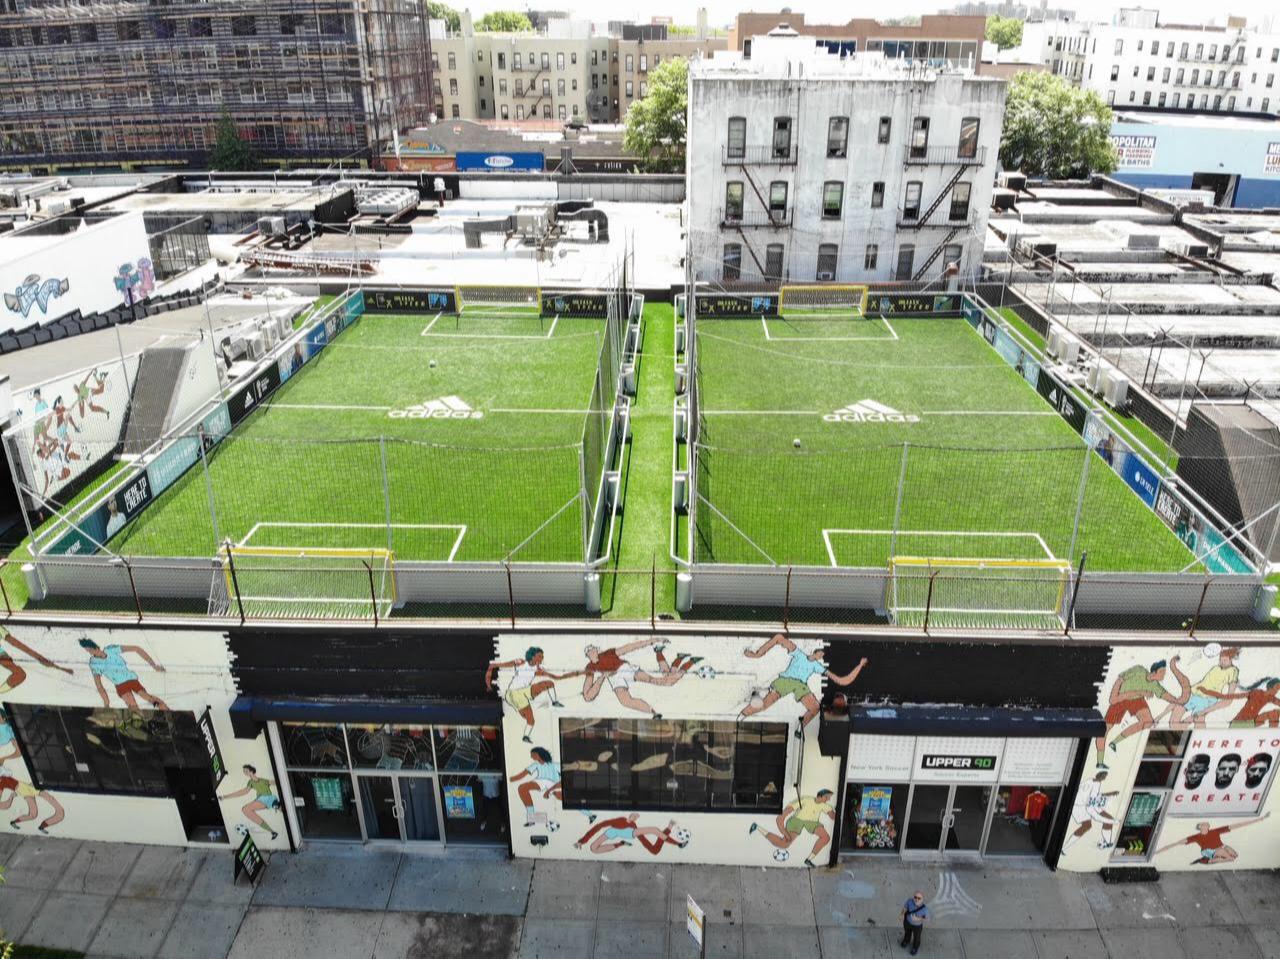 Img 3928 1 1 In 2020 Football Field Gym Setup Stadium Design